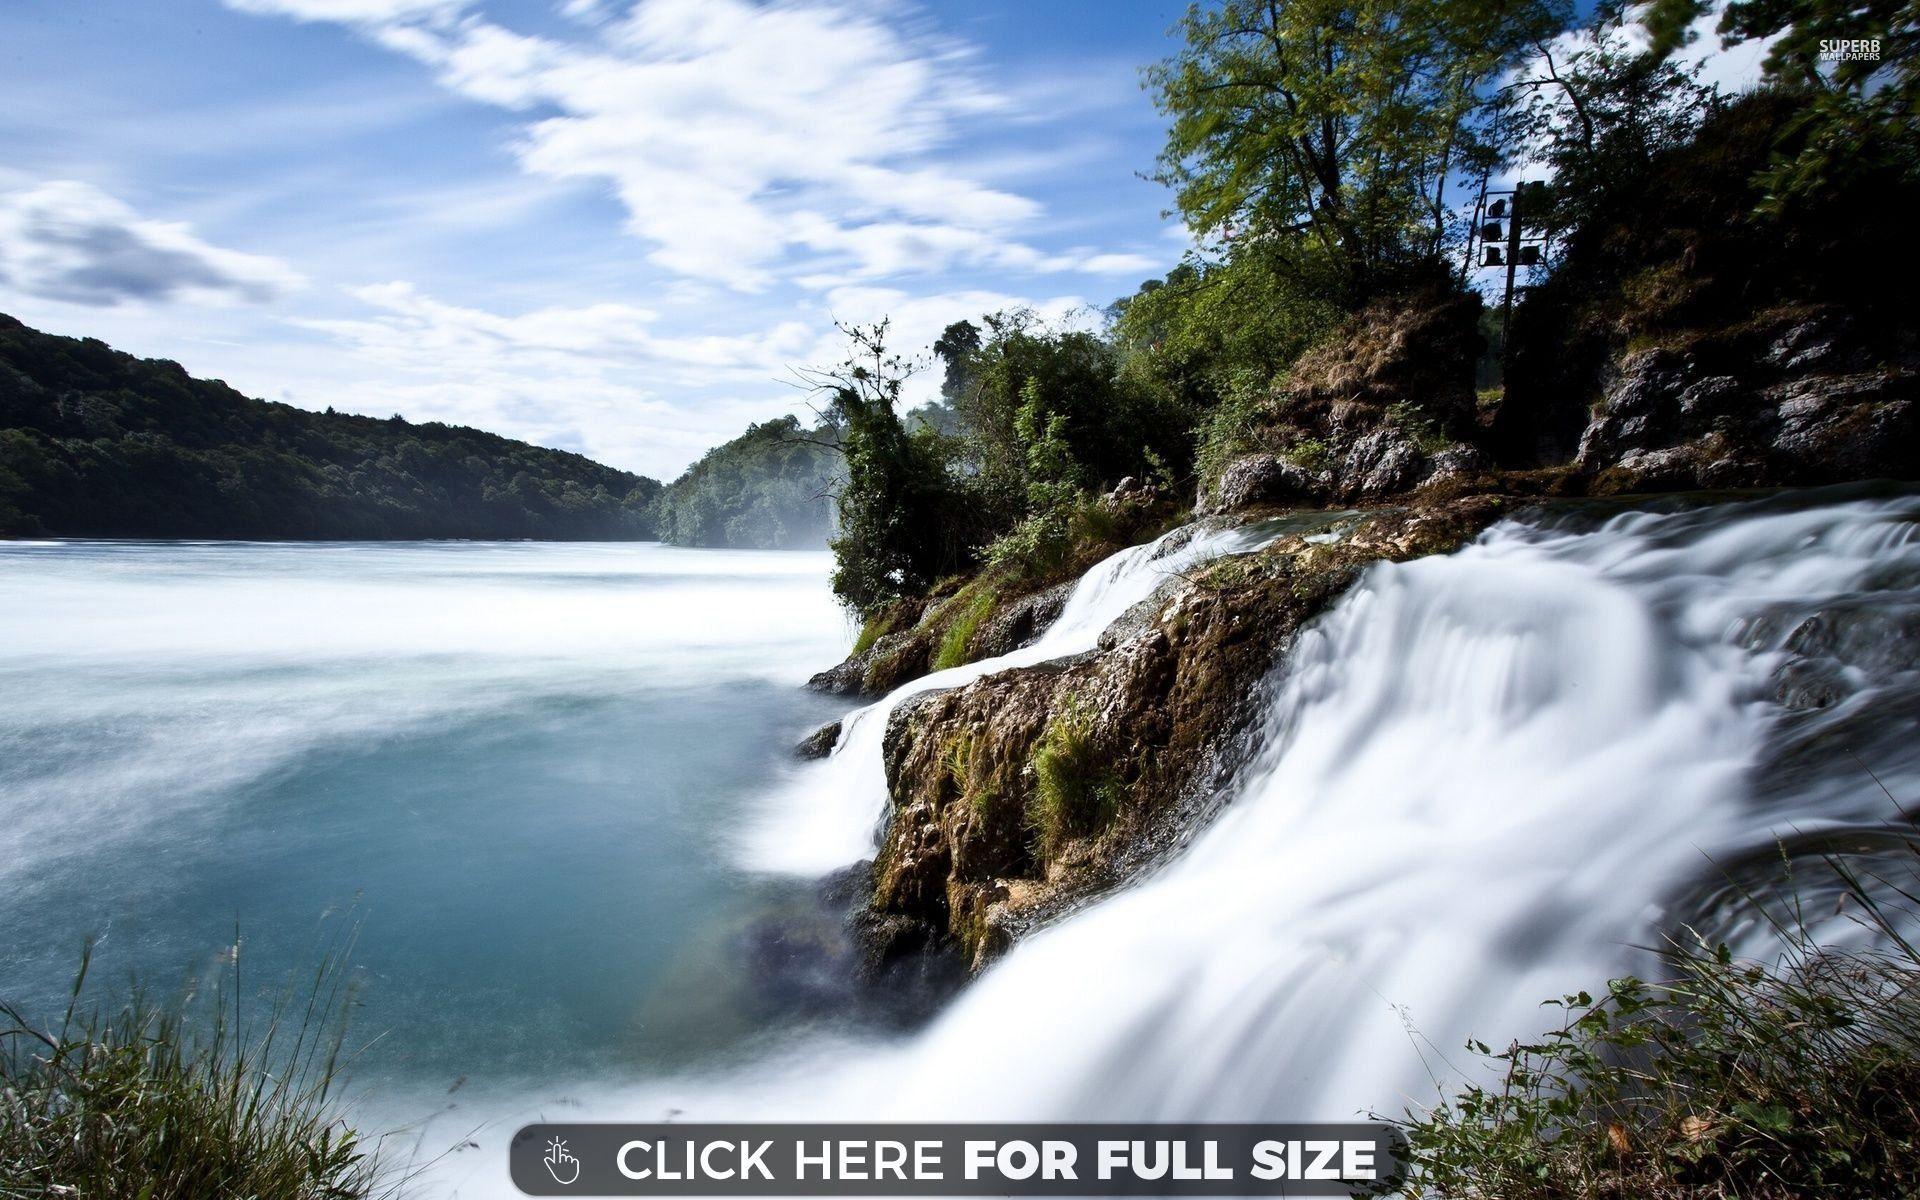 Rhine Falls 17934 Desktop Wallpapers Waterfall wallpaper 4k 1920x1200